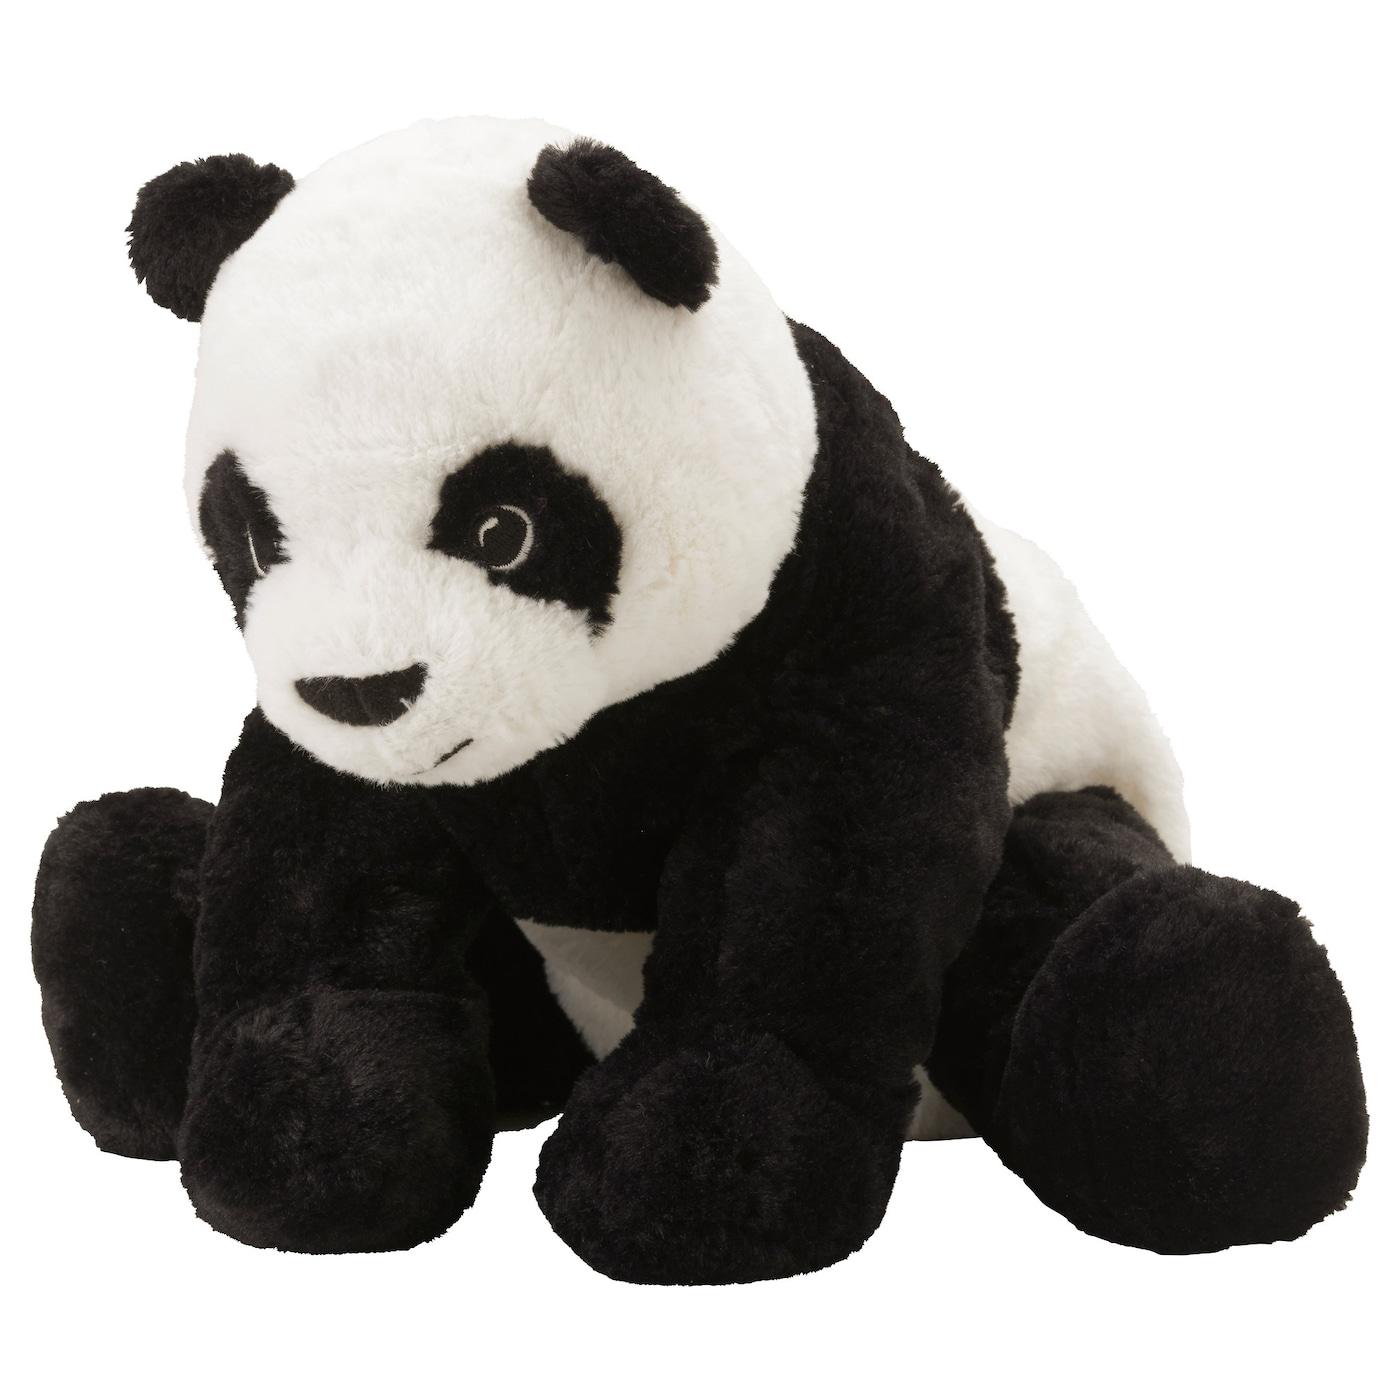 OR GREY FOR KID NEW WHITE 1 x IKEA GOSIG RATTA SOFT PLUSHTOY RAT MOUSE BLACK